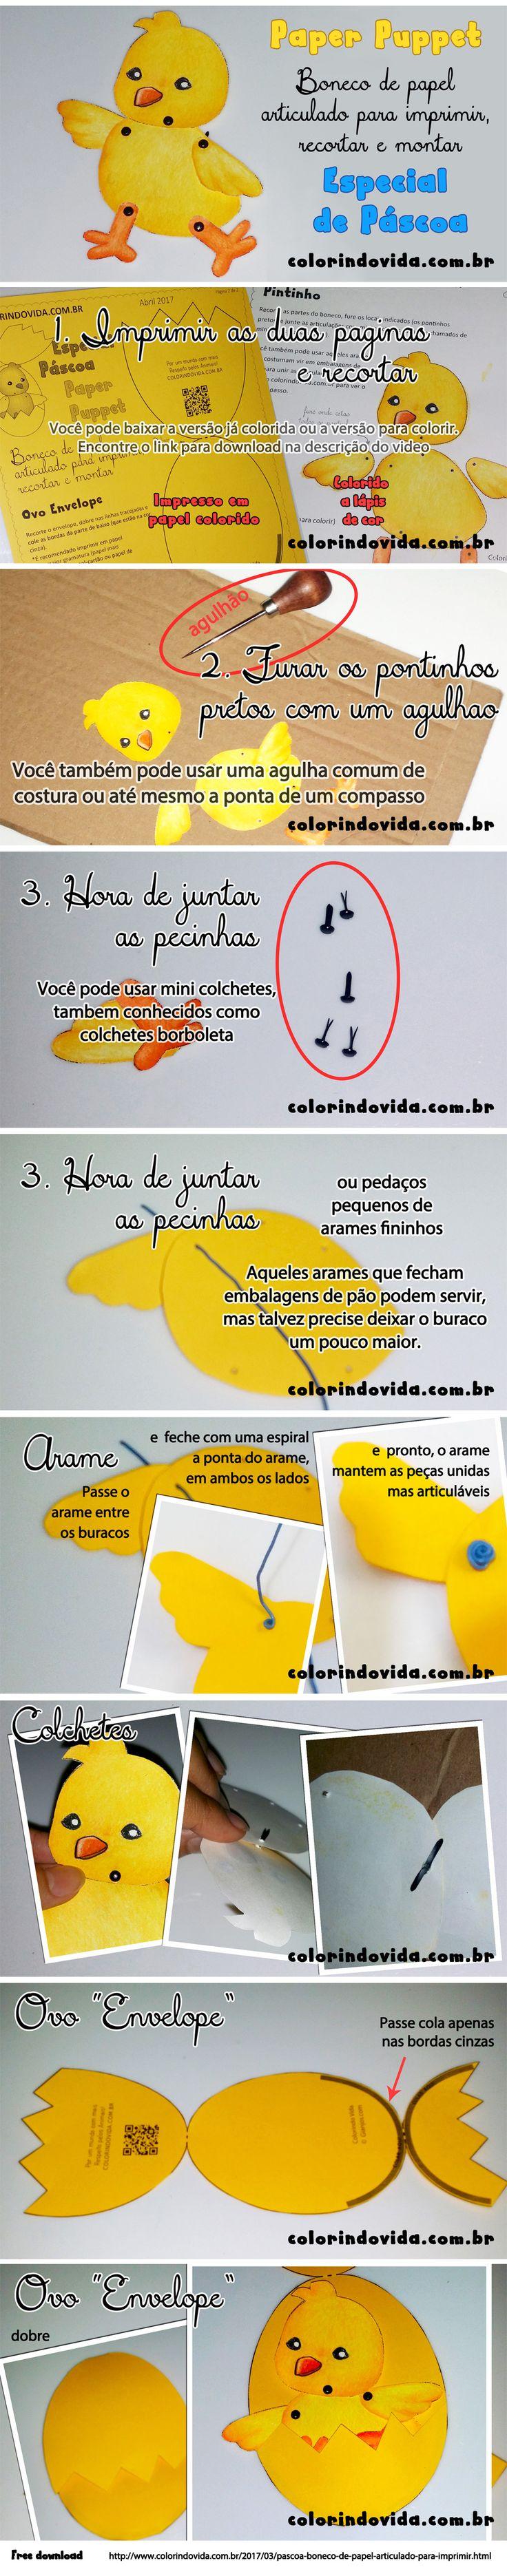 Boneco de Papel para Páscoa / Paper Puppet: http://www.colorindovida.com.br/2017/03/pascoa-boneco-de-papel-articulado-para-imprimir.html